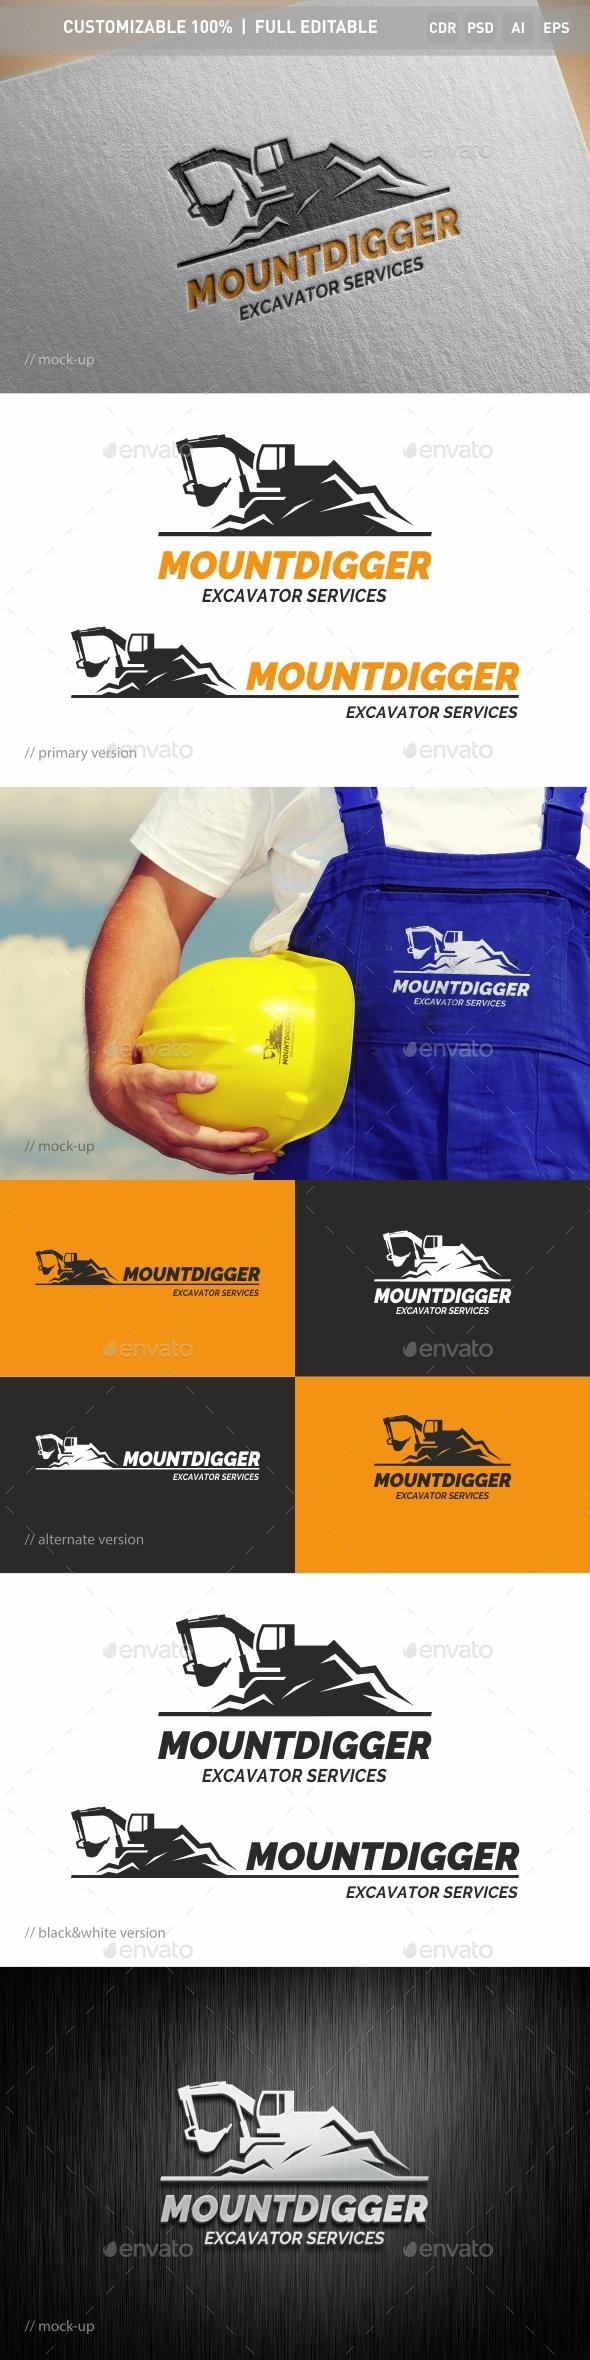 Mountdigger Logo Template